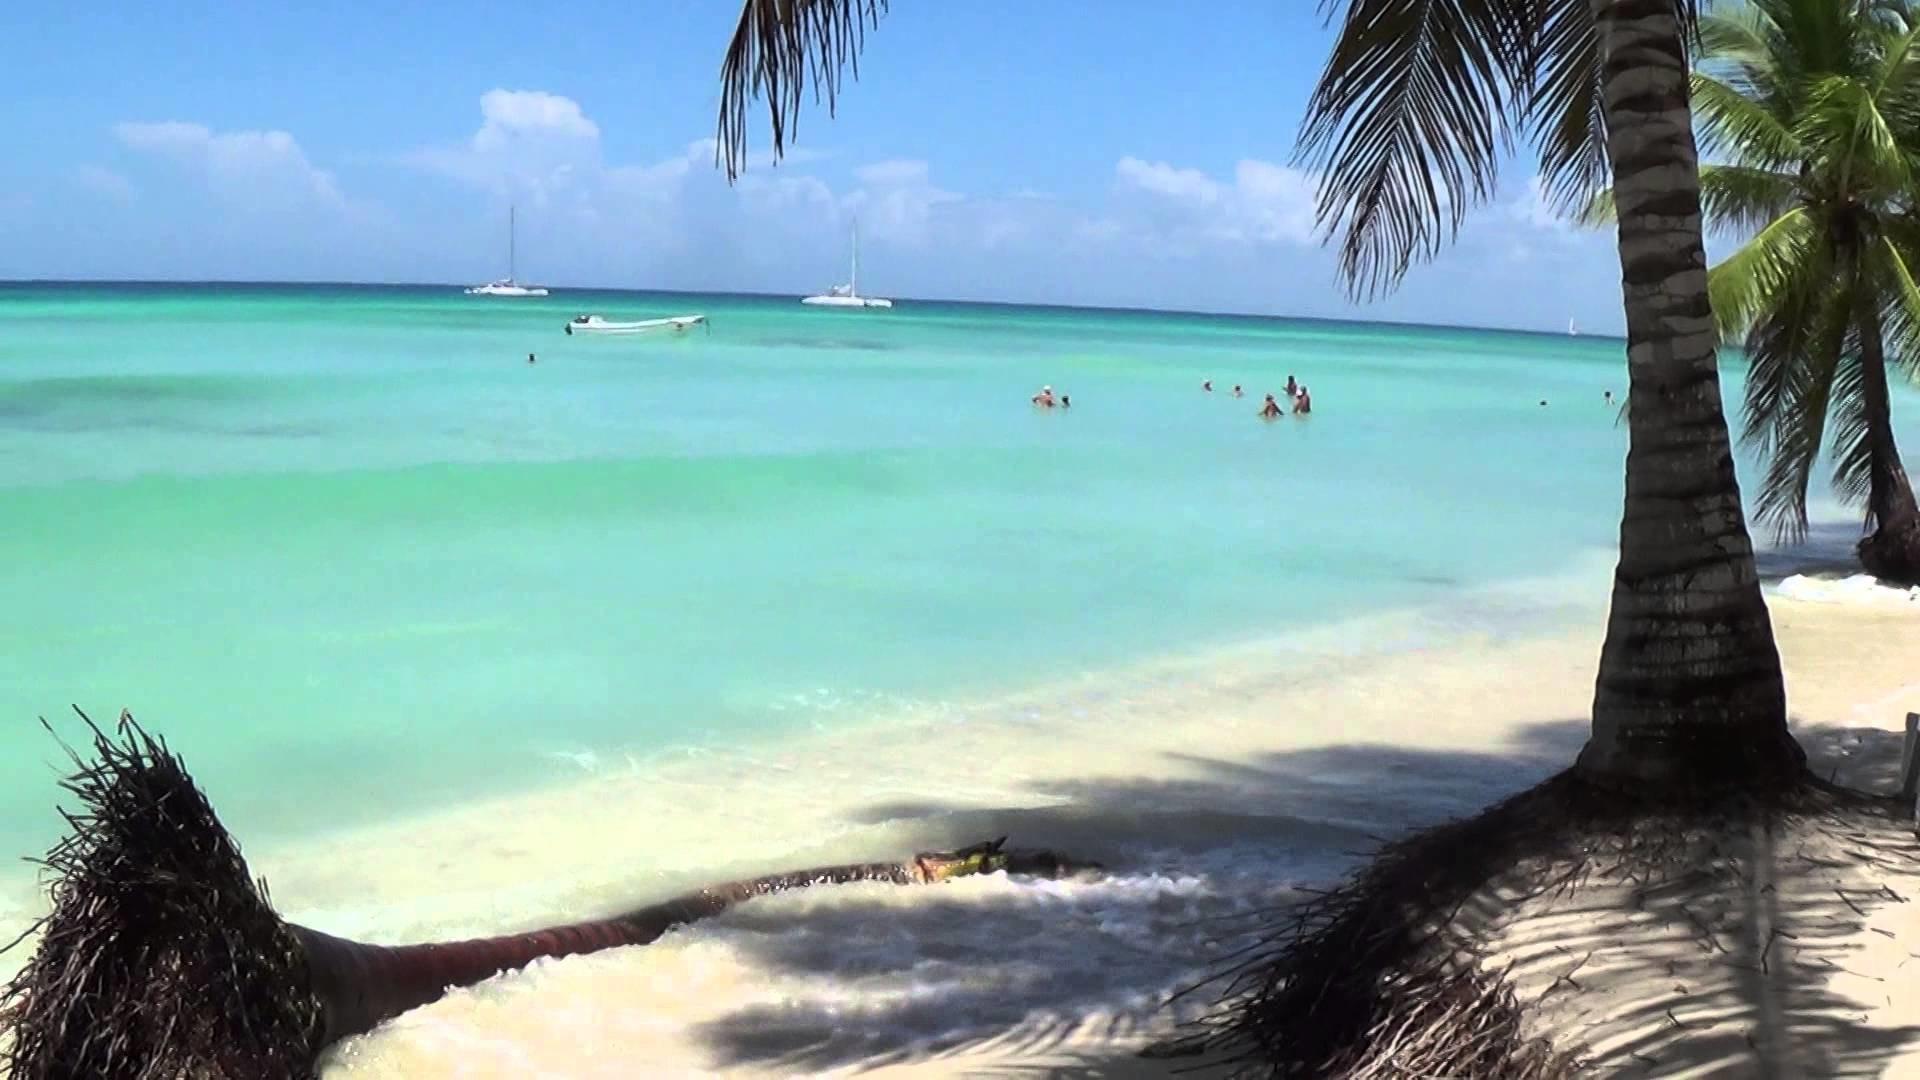 Beautiful Beach Saona Island (Dominican Republic 2014)